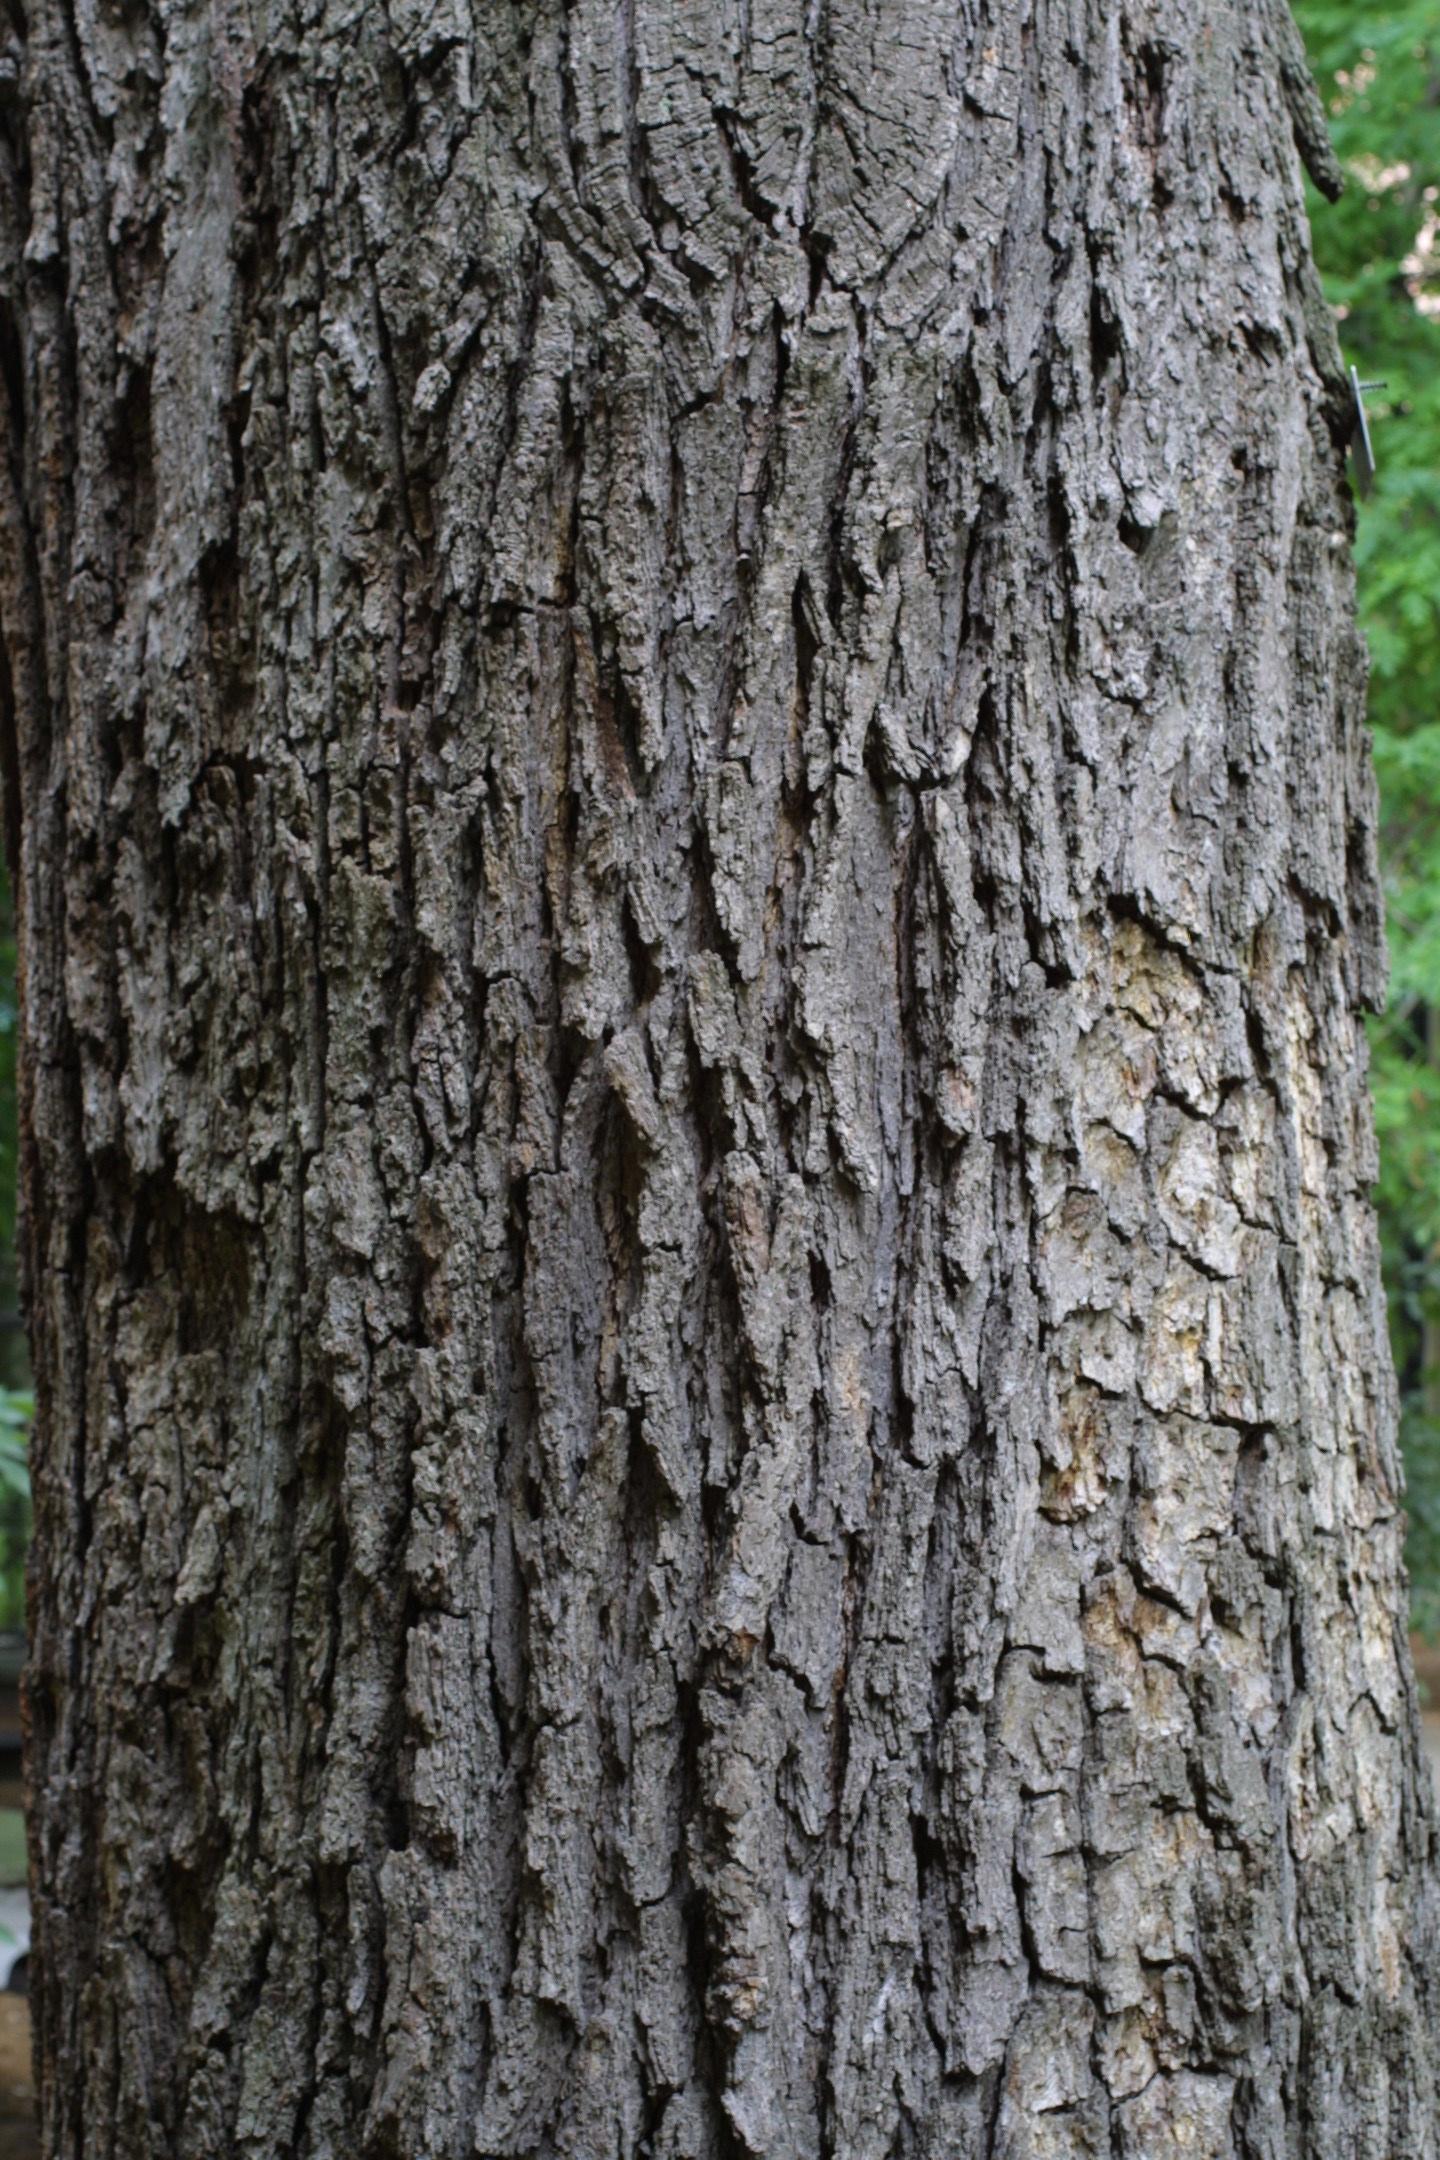 Quercus bicolor swamp white oak nre also eeb or